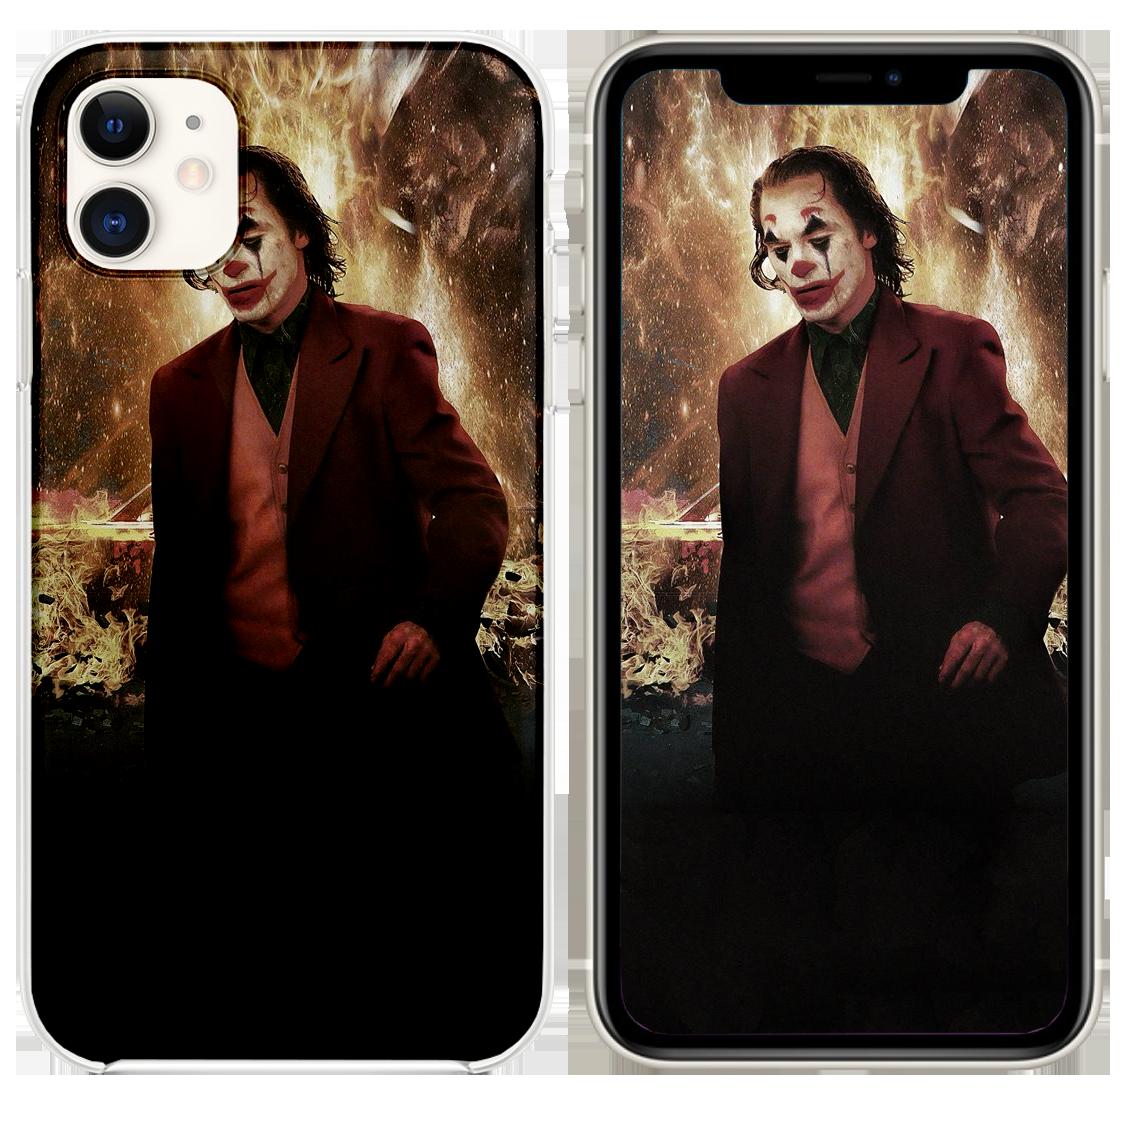 Joker 2019 Movie 4k New Iphone 11 Case And Wallpaper New Iphone Joker Joker Iphone Wallpaper